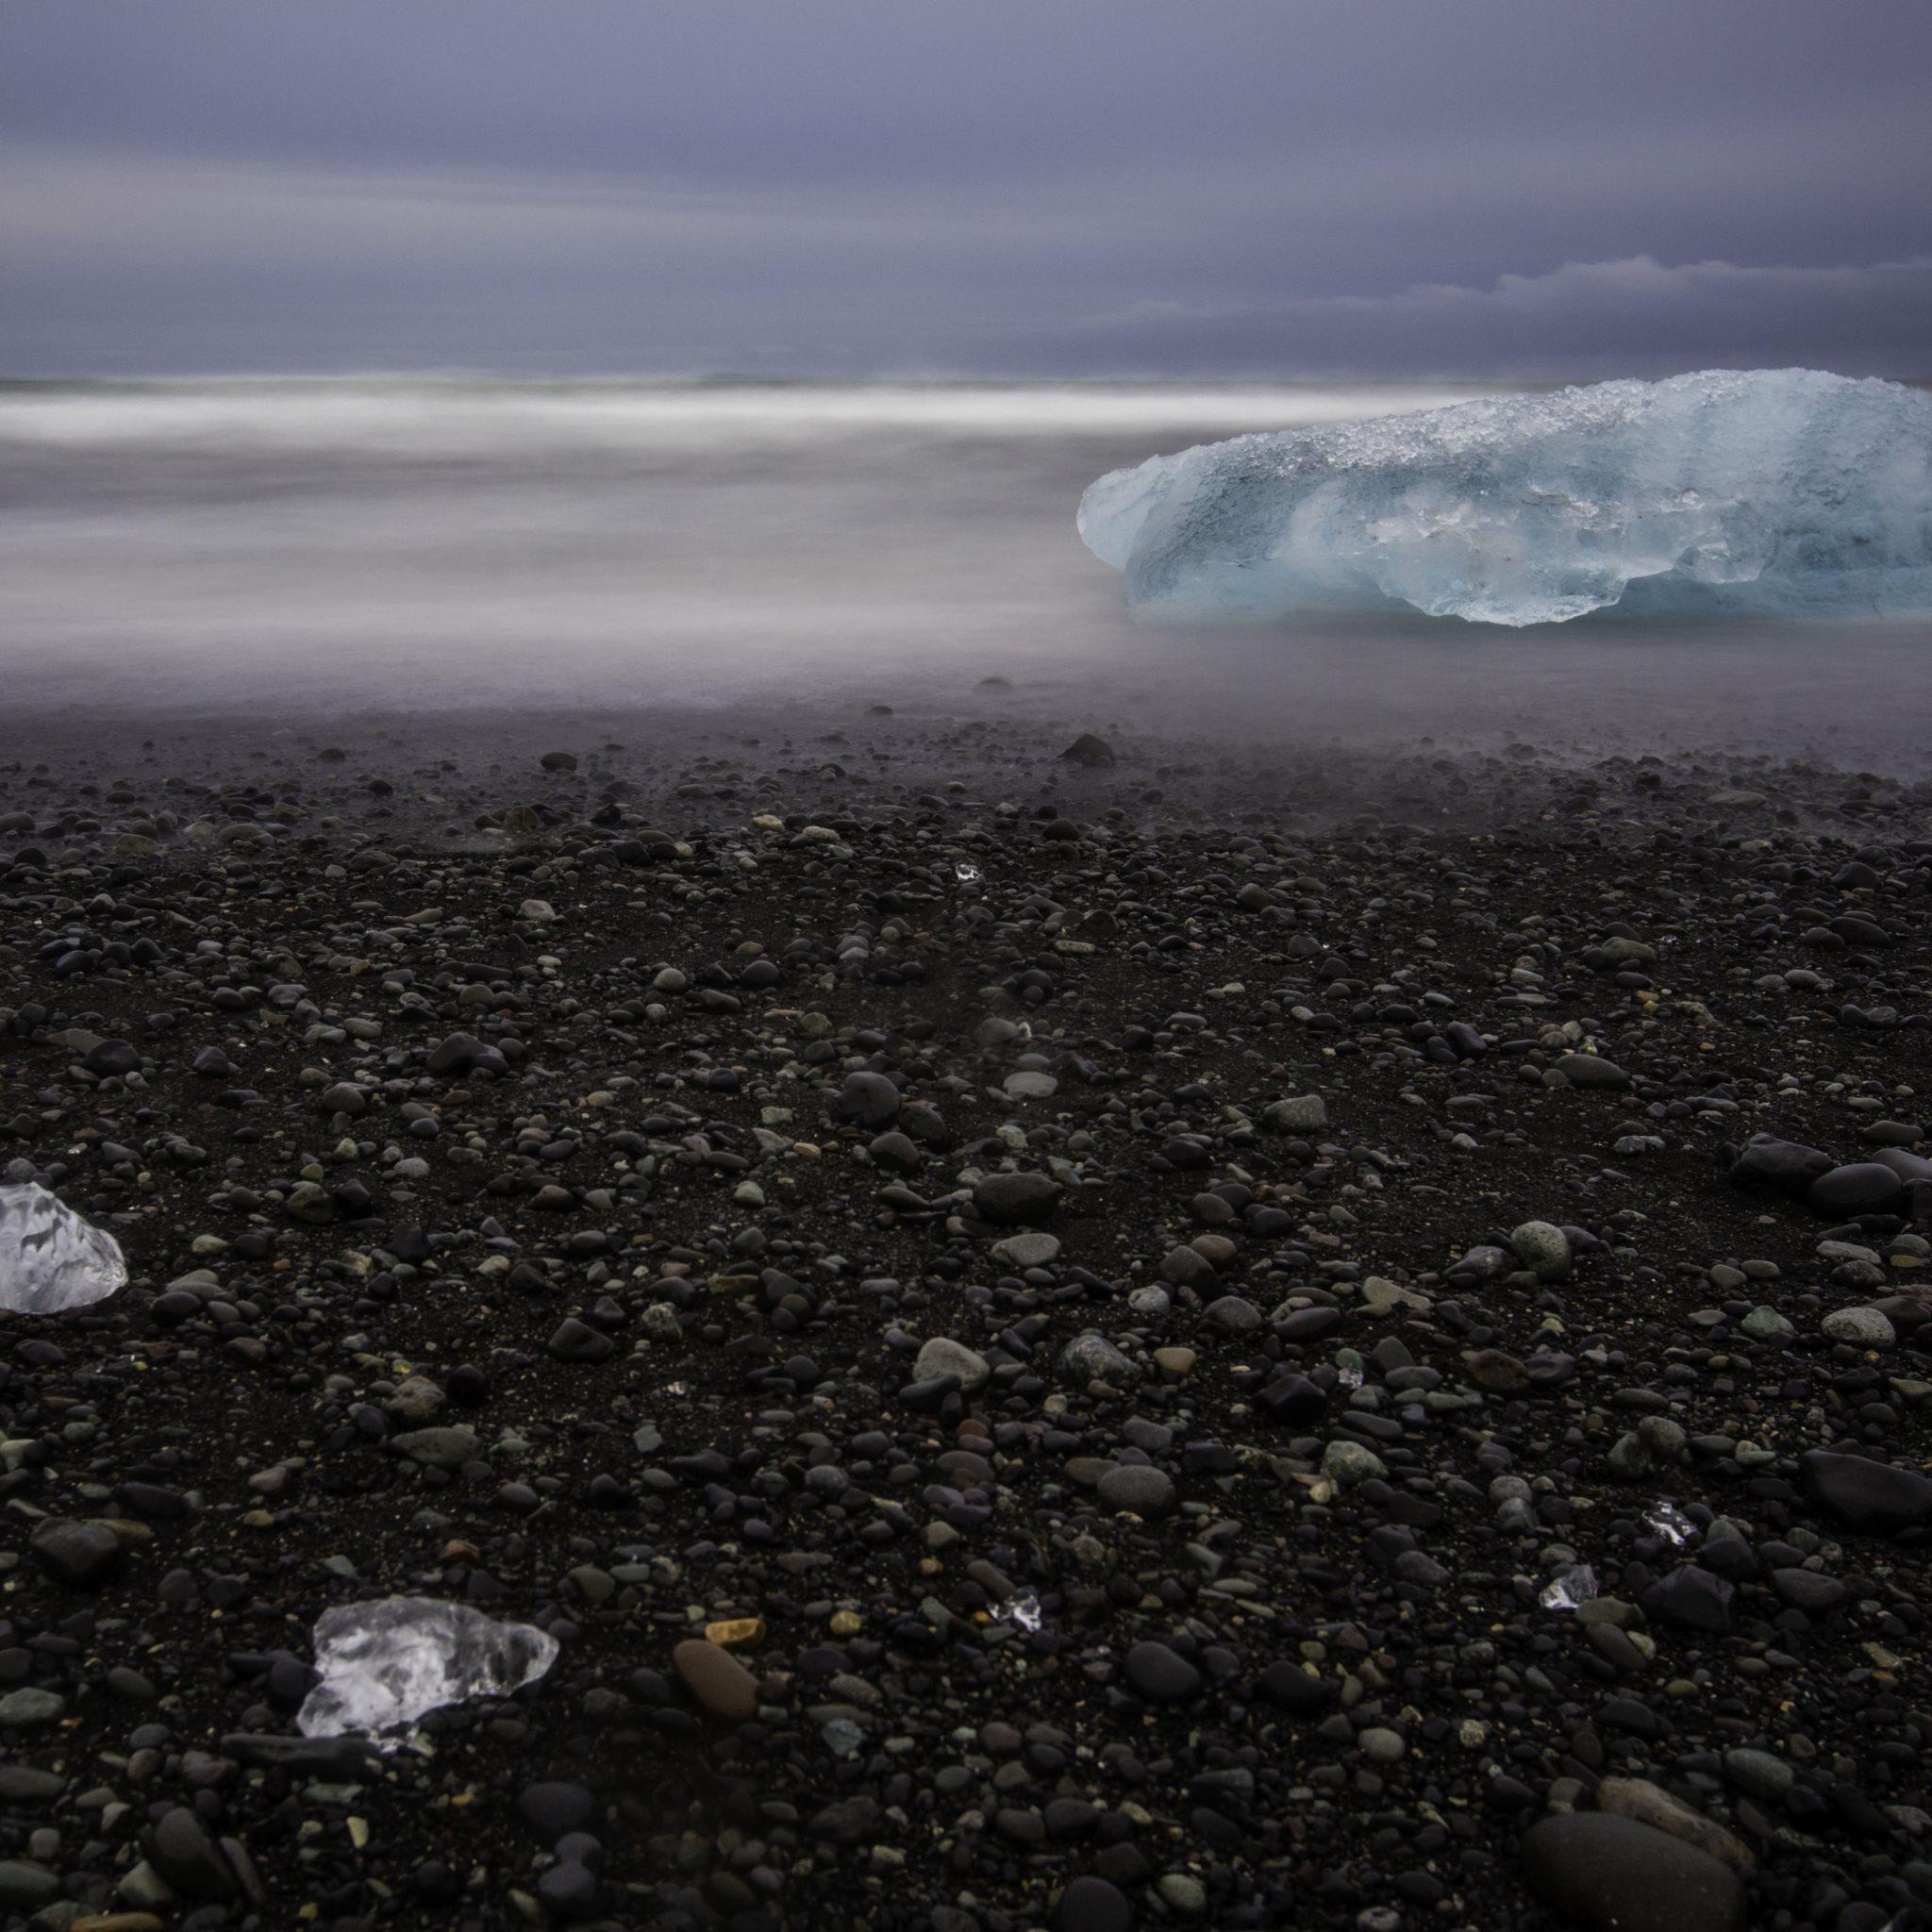 iceland 4k wallpaper - photo #26